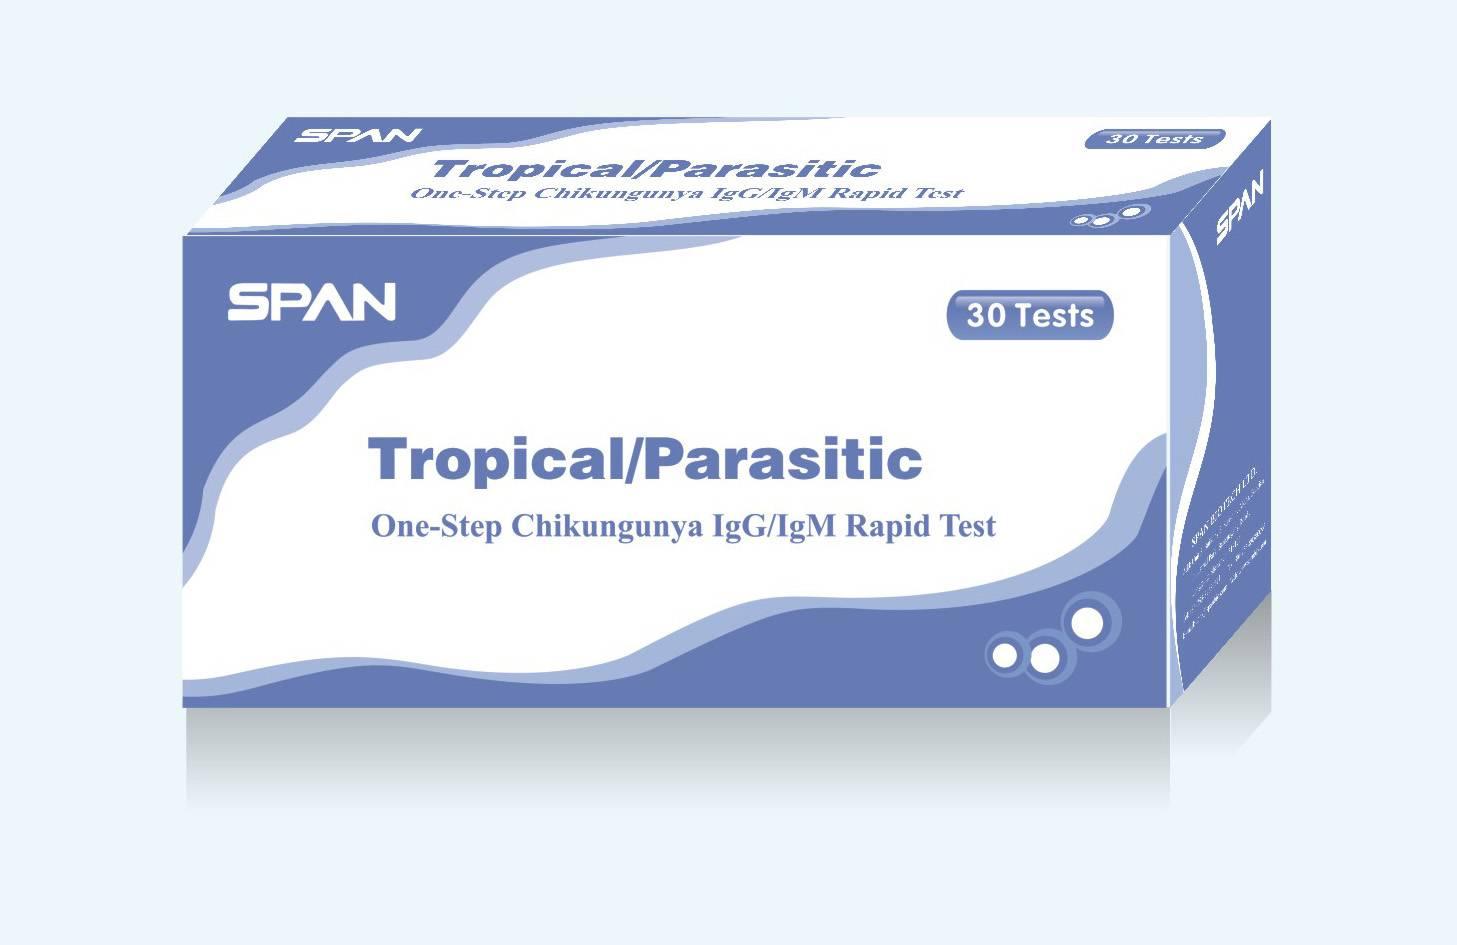 Chikungunya Ab Rapid Test